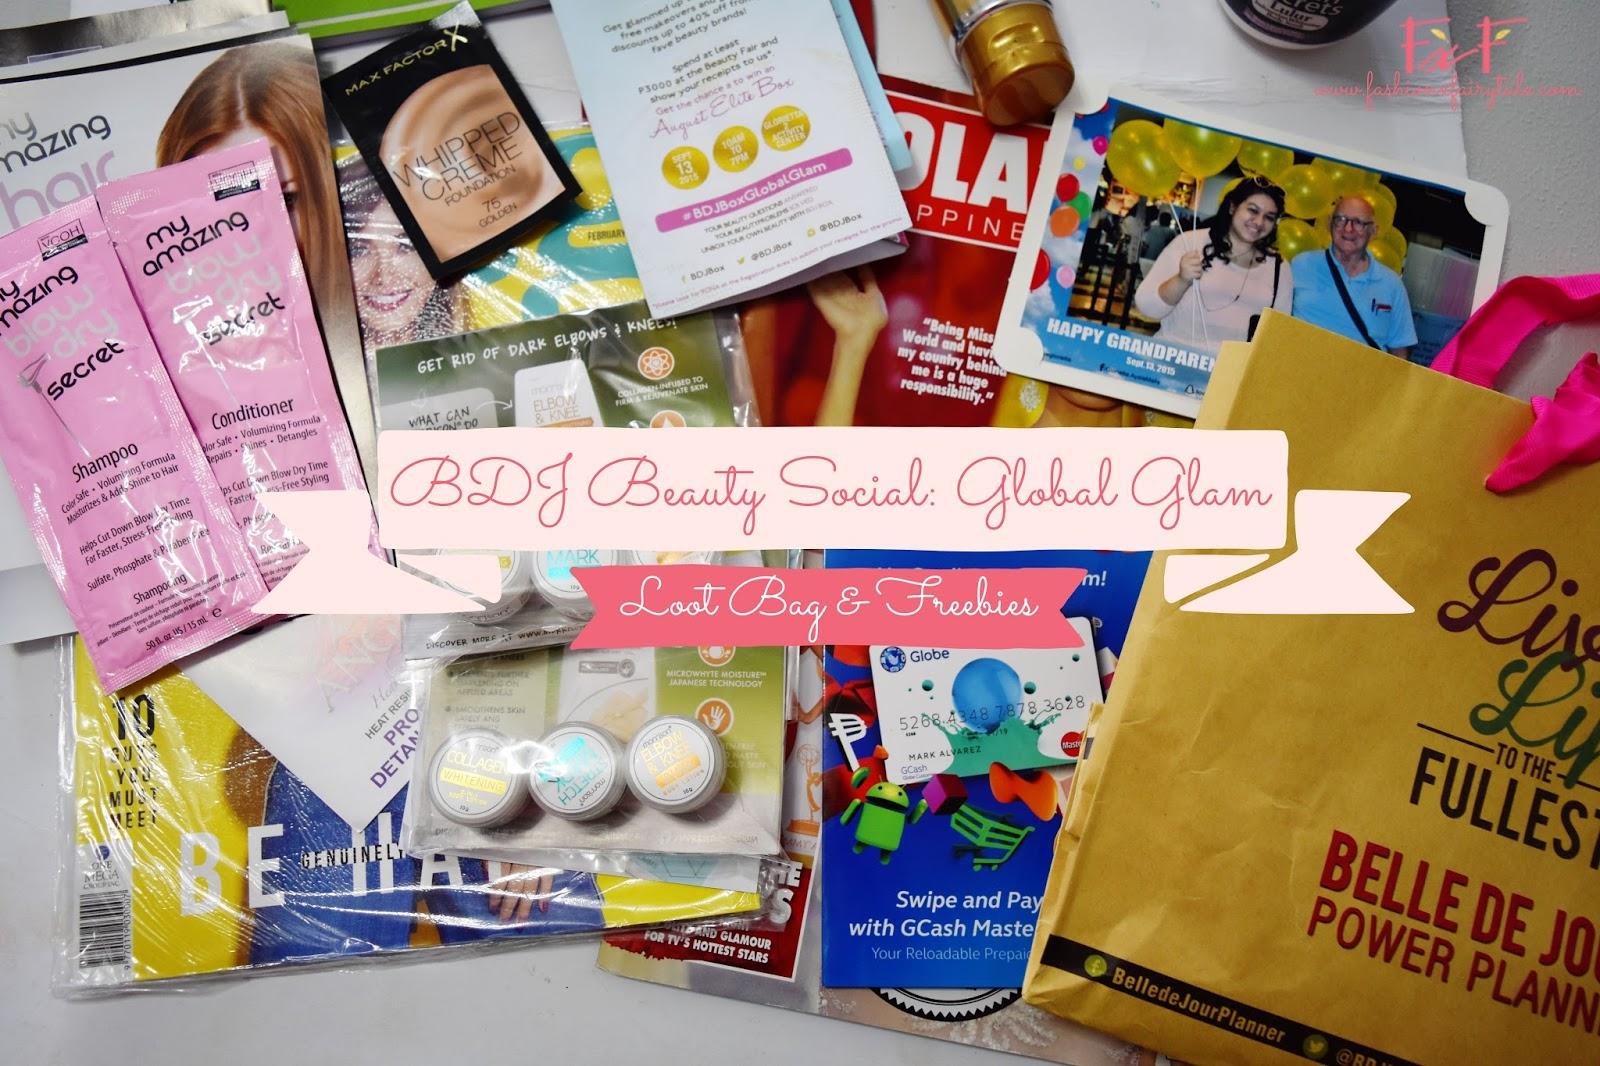 BDJ Beauty Social: Global Glam | Loot Bag & Freebies